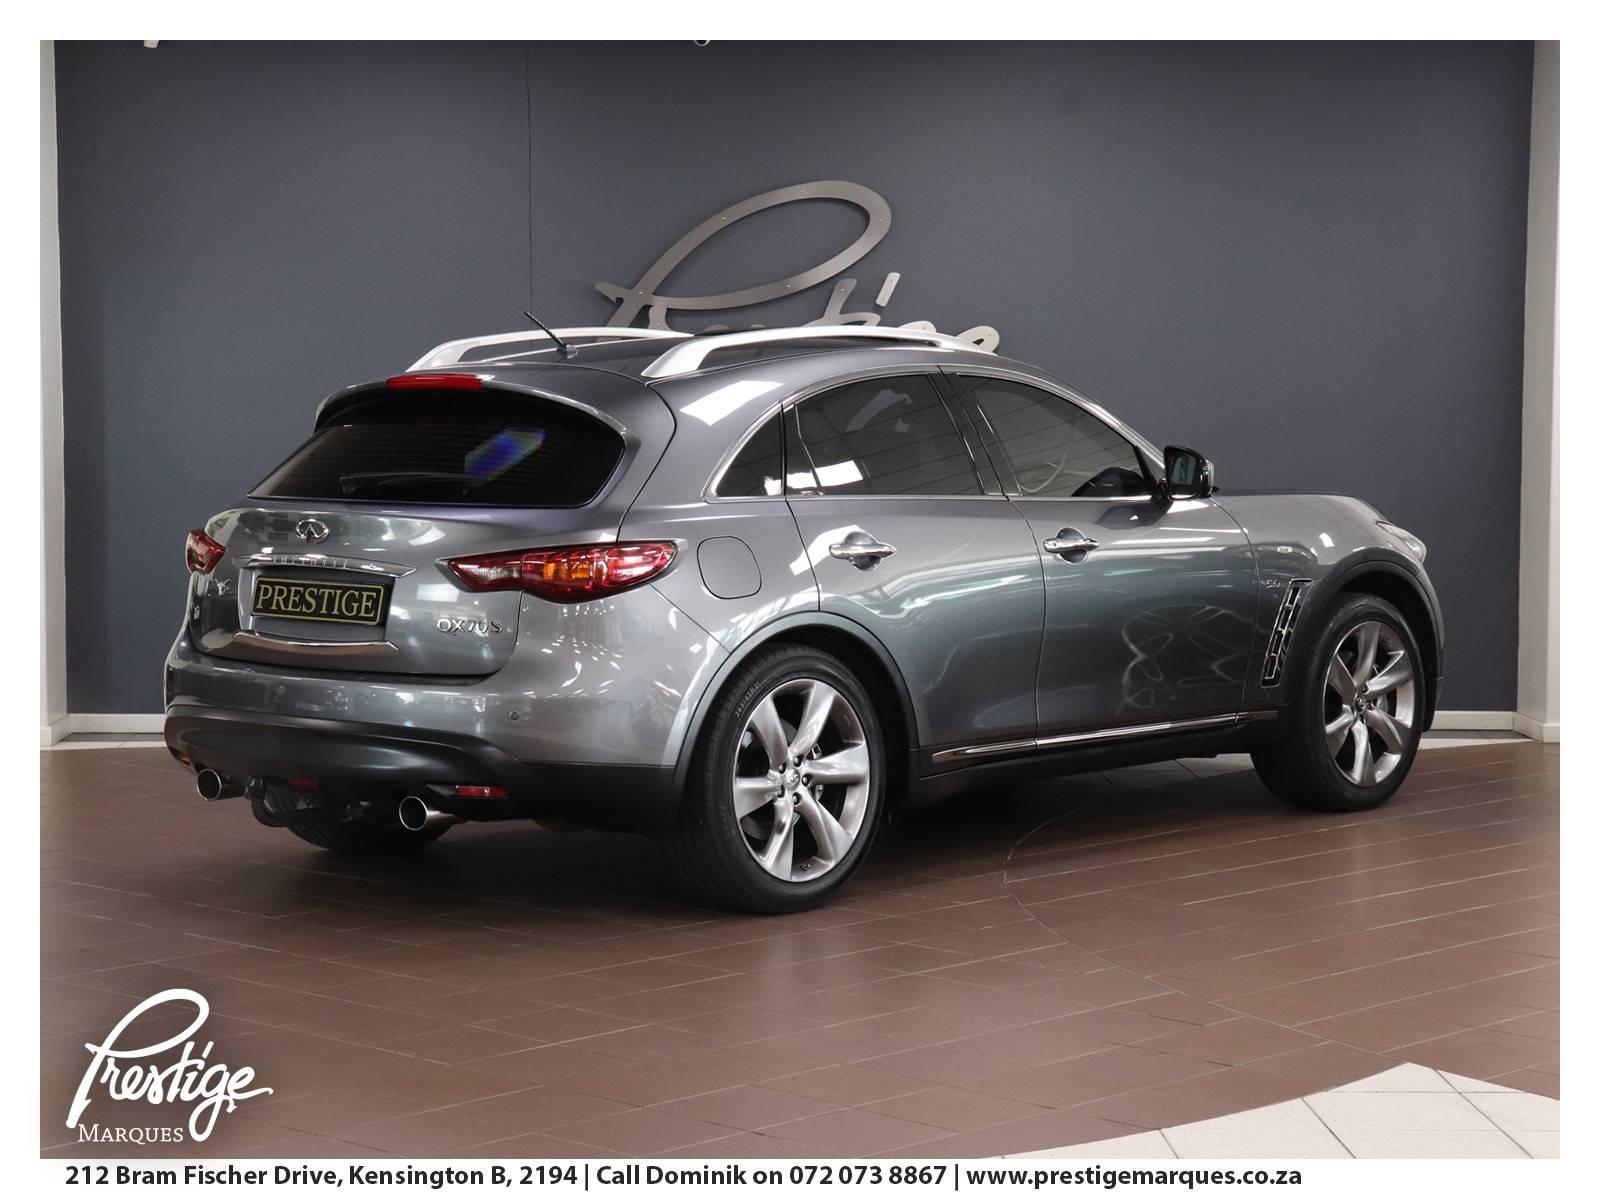 2014- infinity-Qx70 s- (5.L V8)- Prestige-Marques-Randburg-Sandton-4